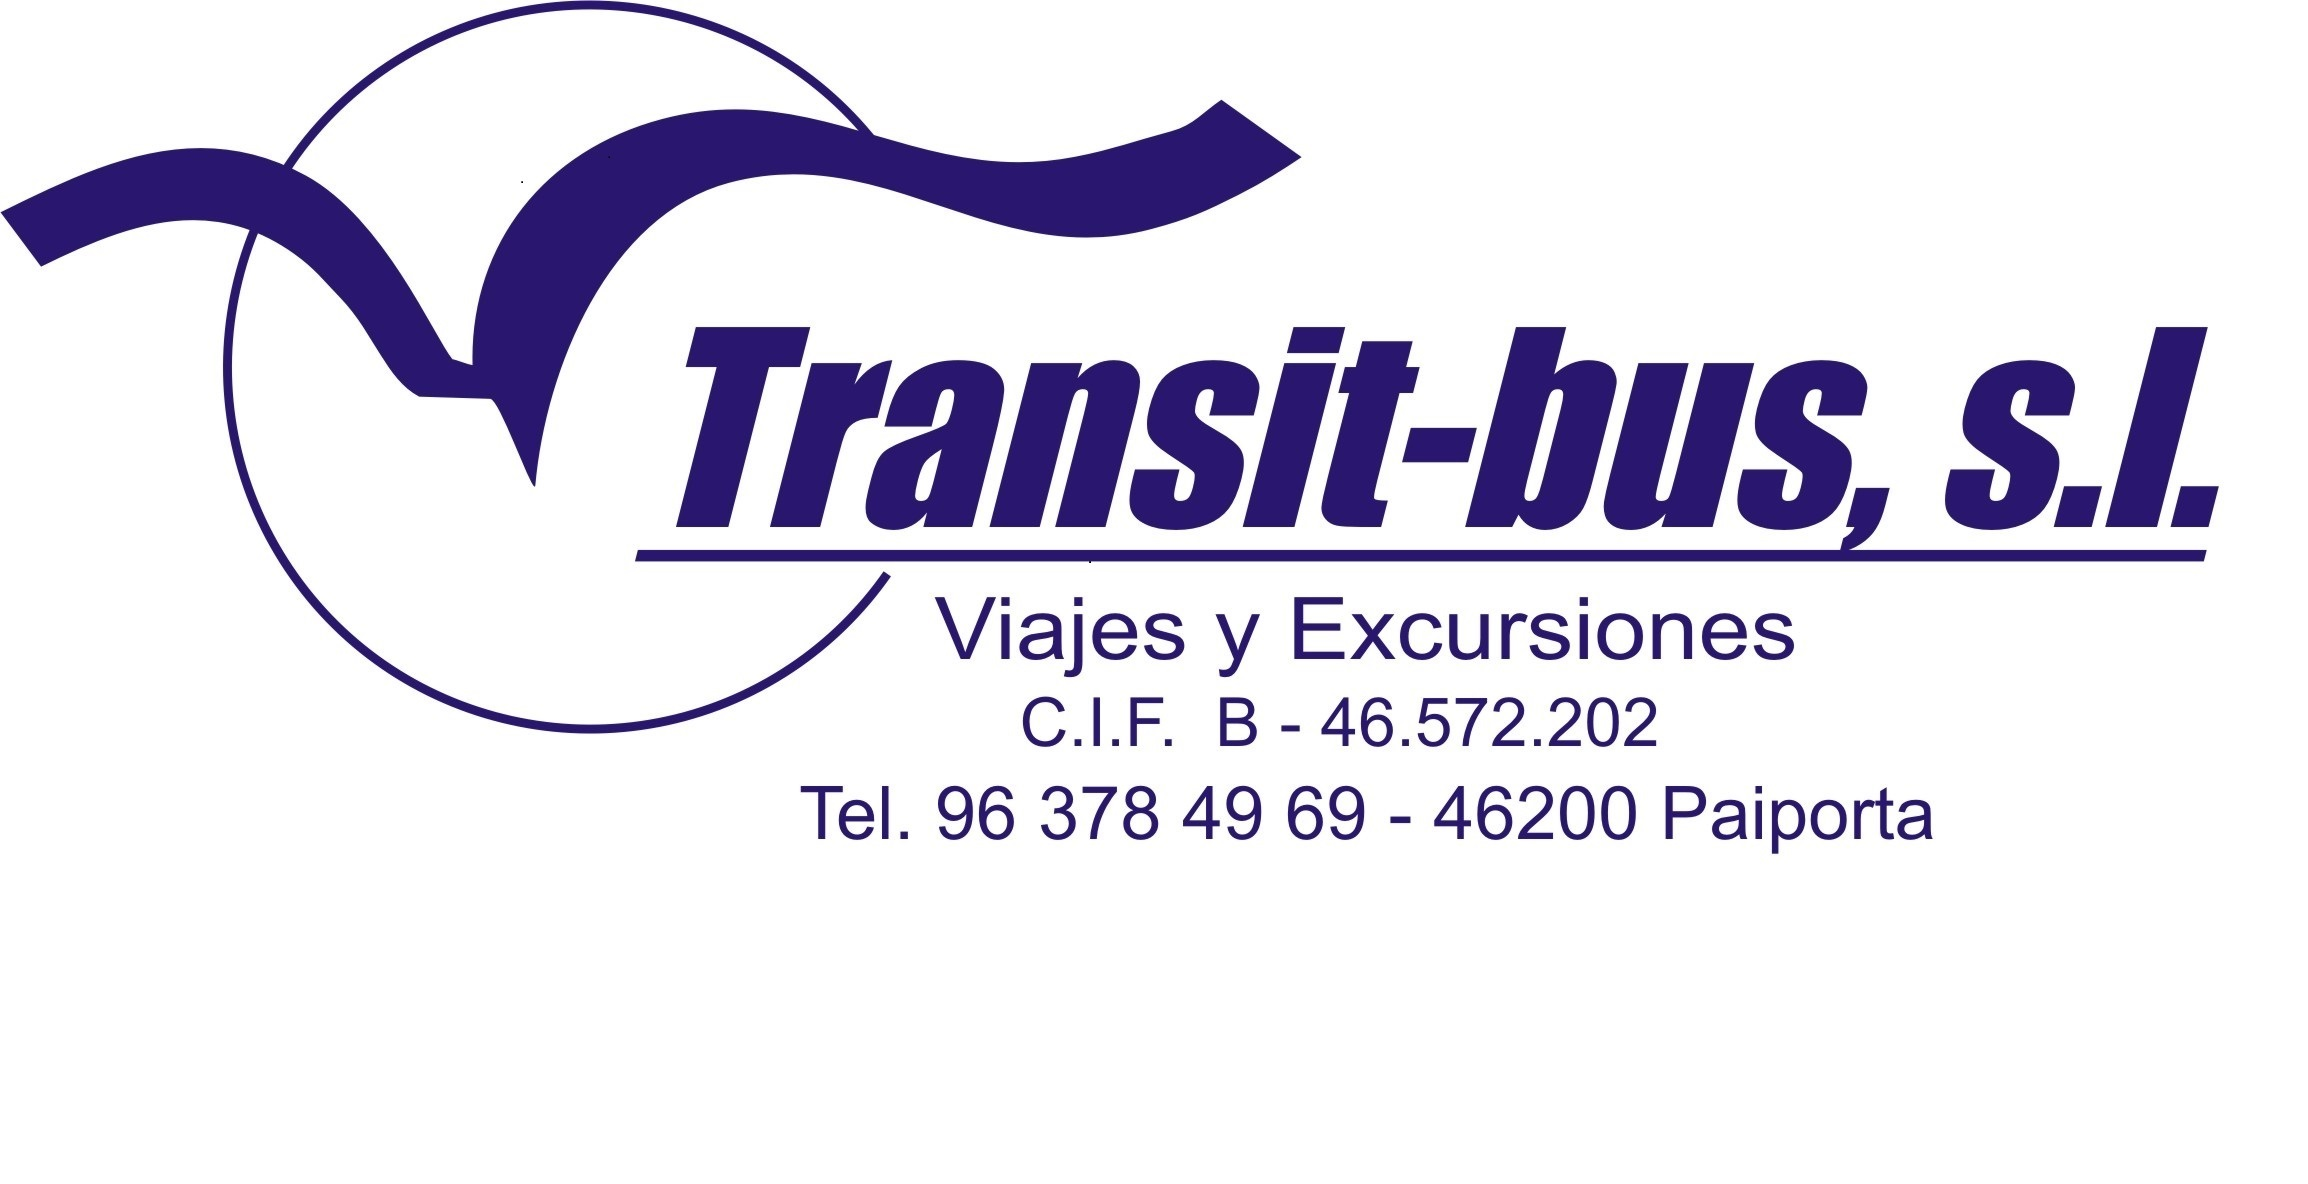 TRANSIT BUS S.L